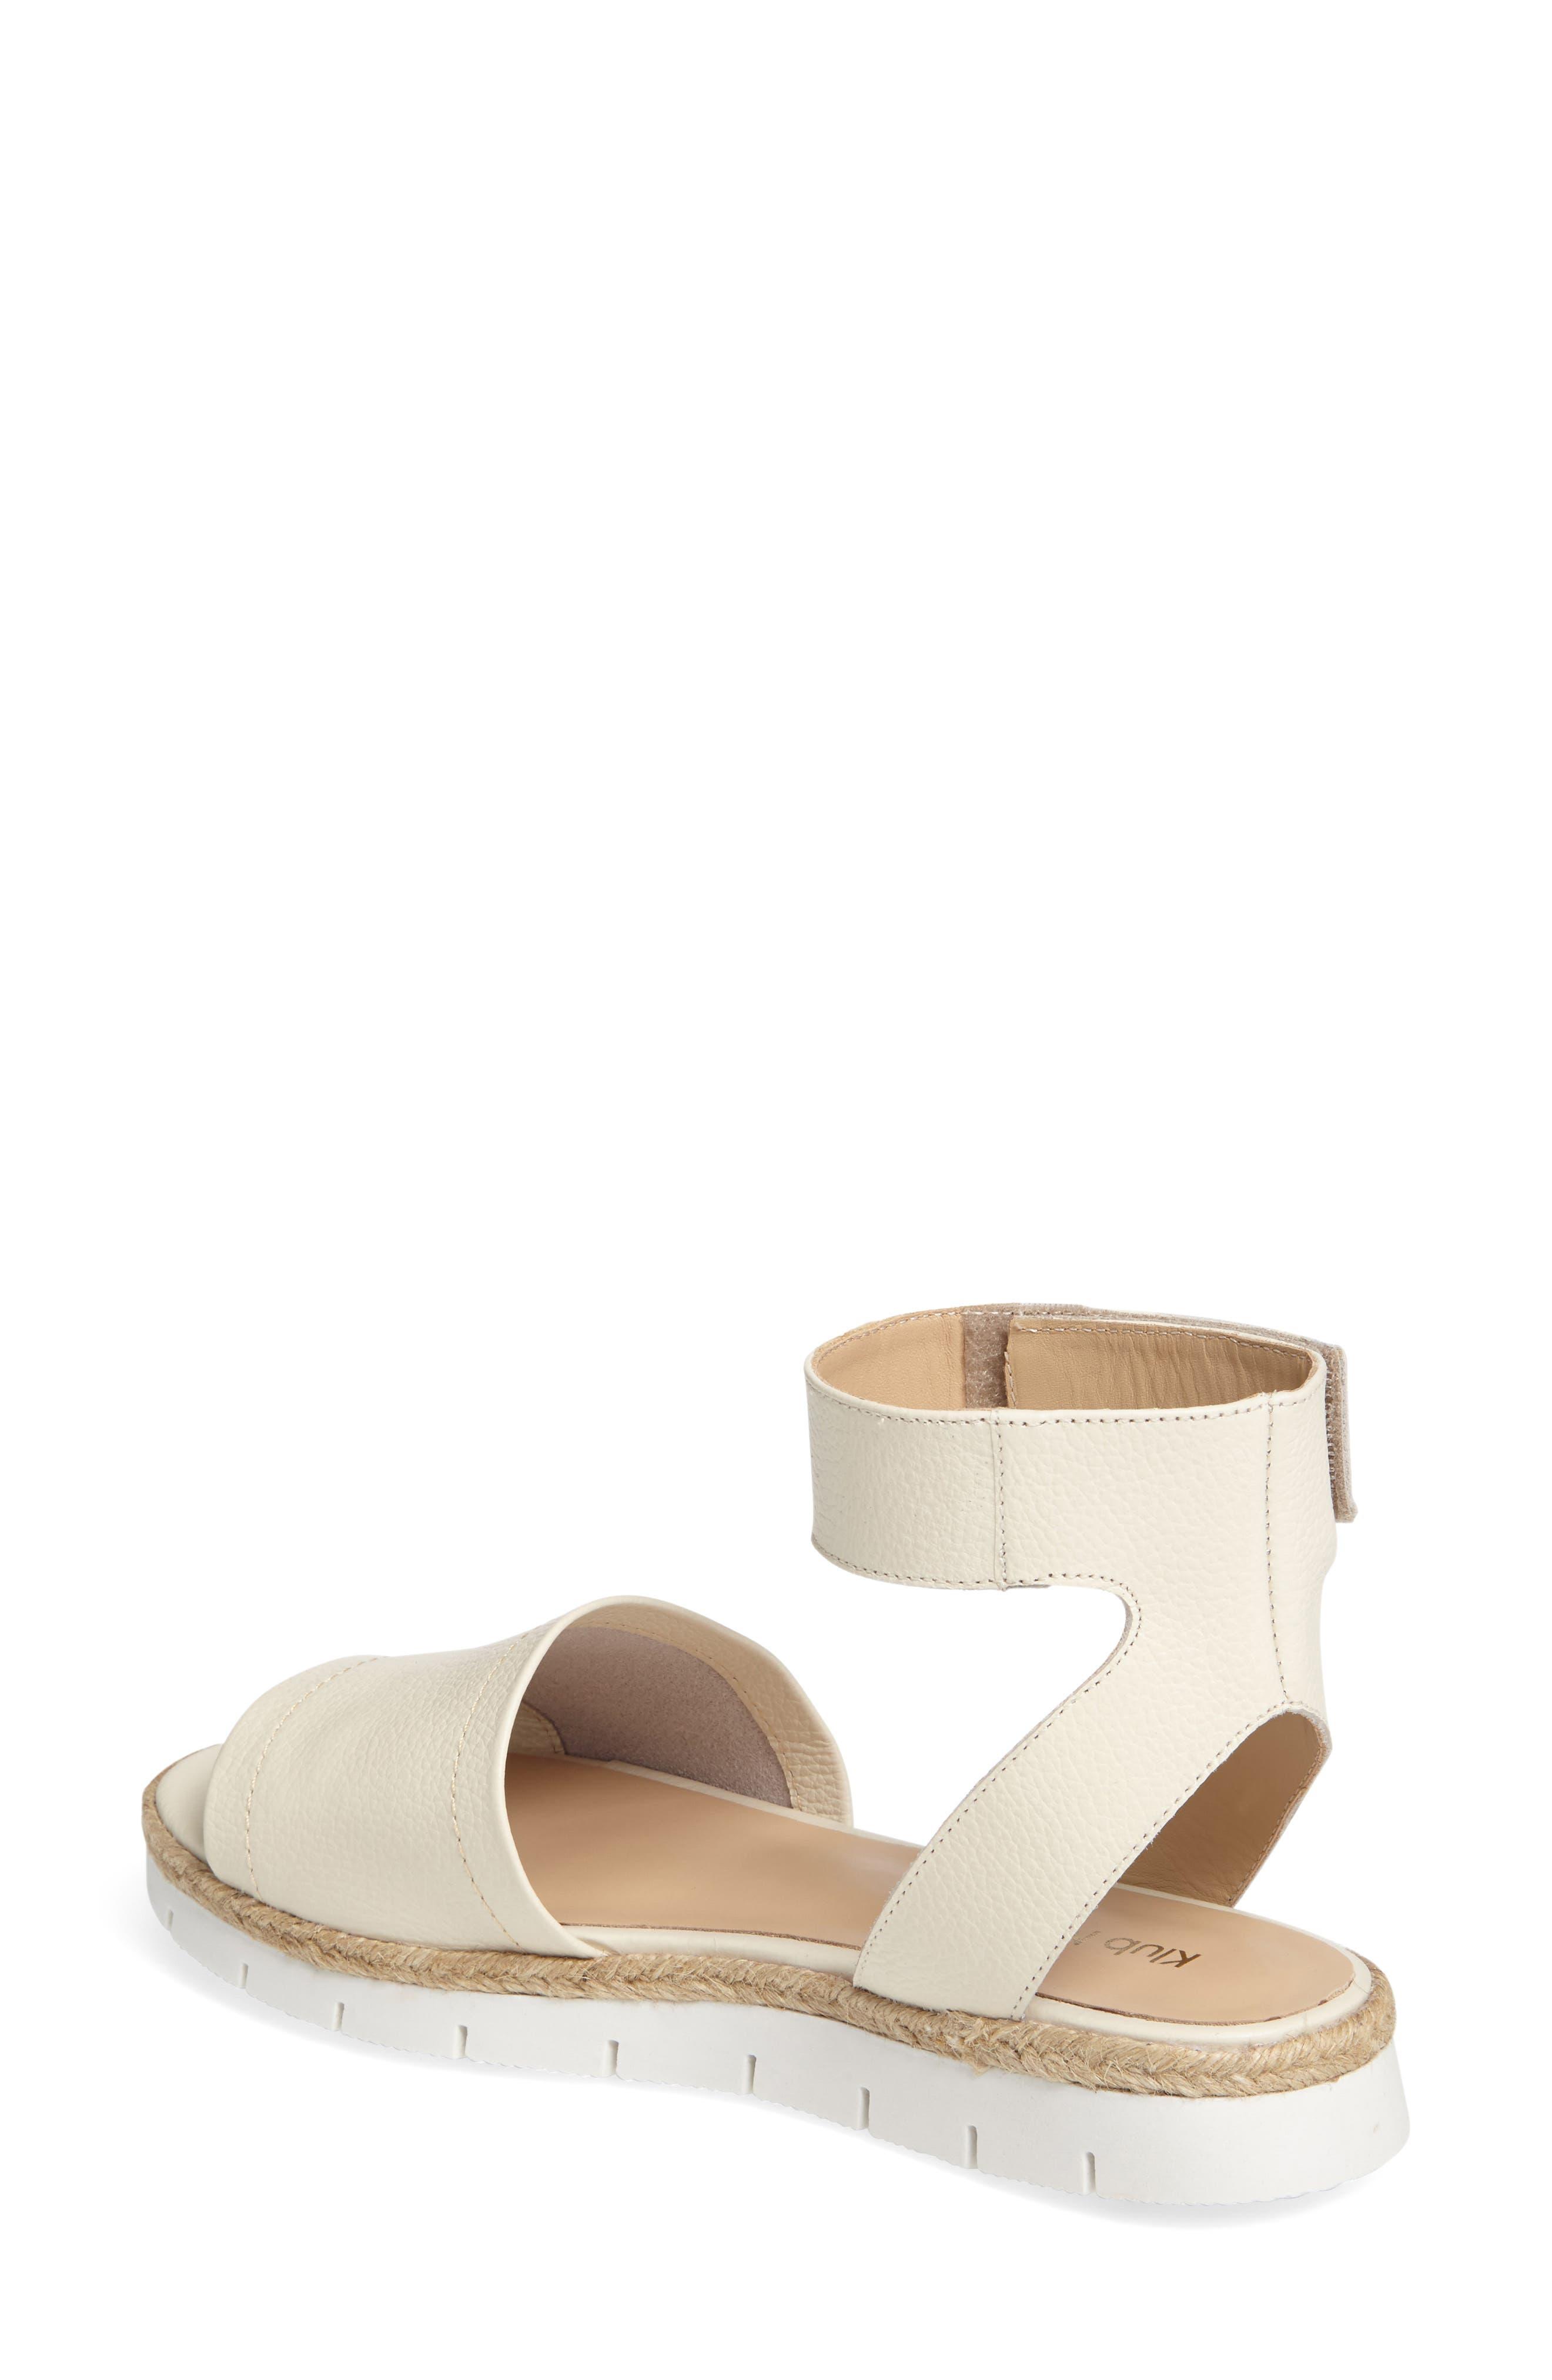 Cleo Platform Sandal,                             Alternate thumbnail 6, color,